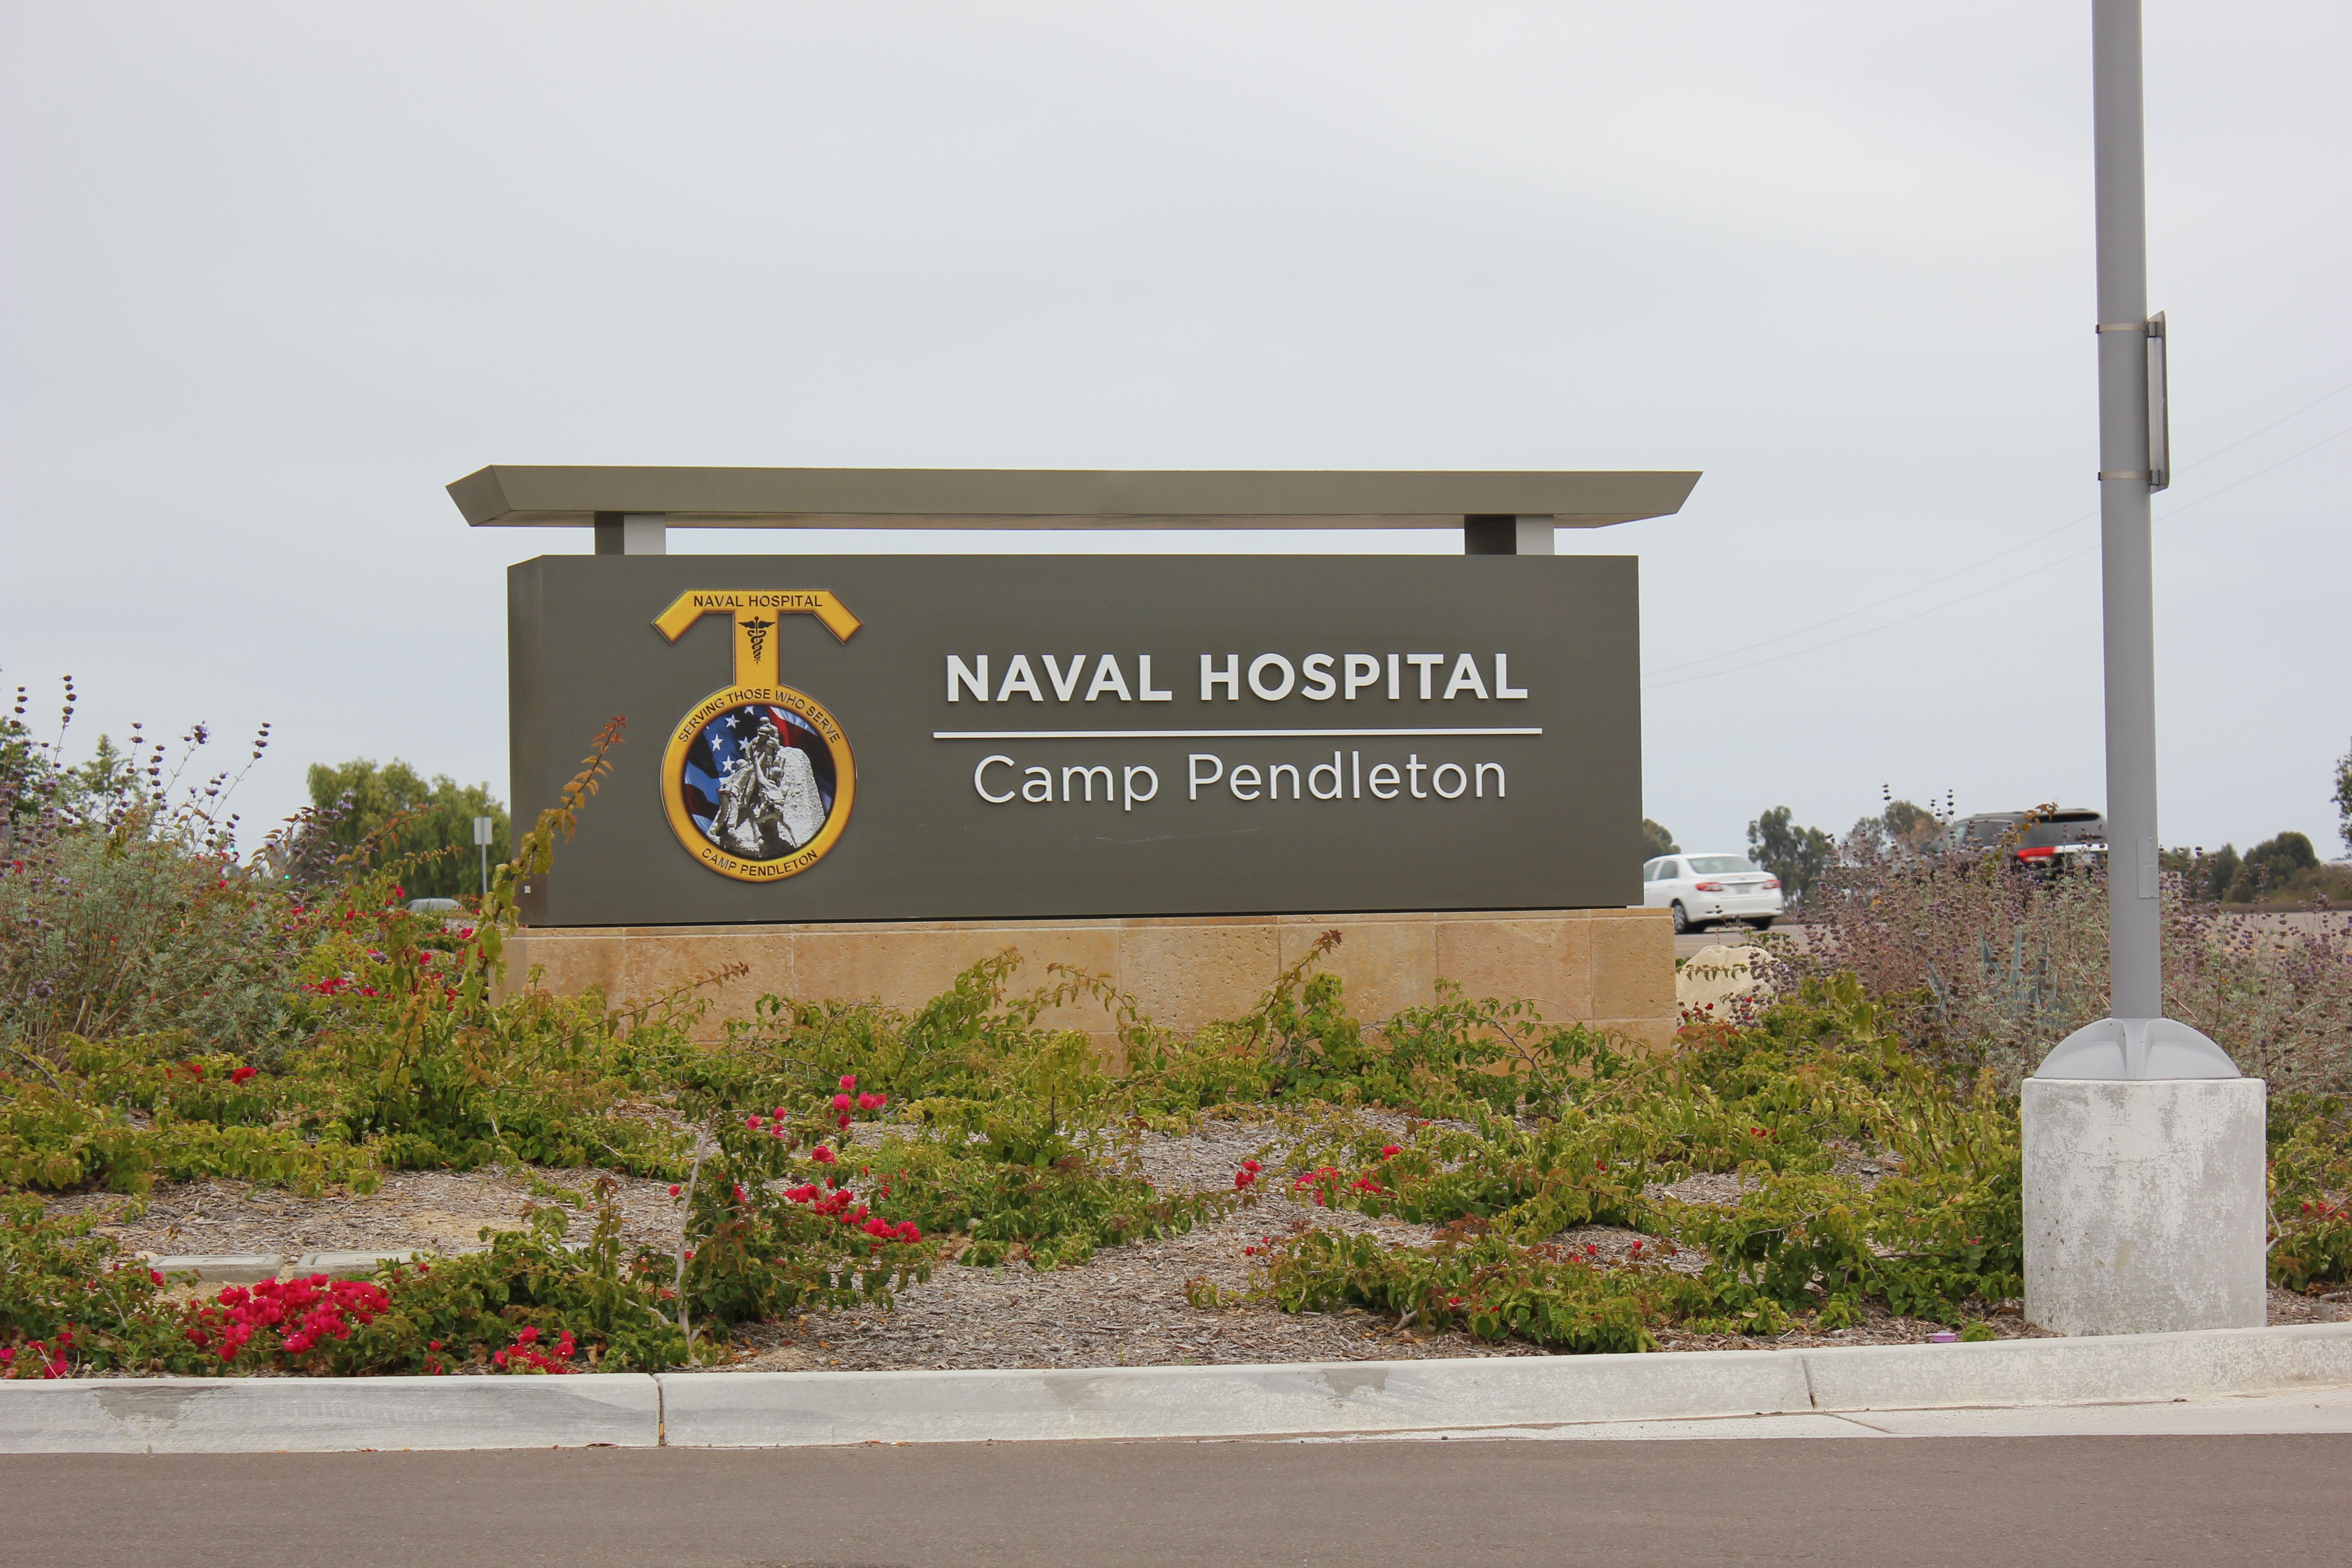 The new Naval Hospital on Camp Pendleton Oceanside CA